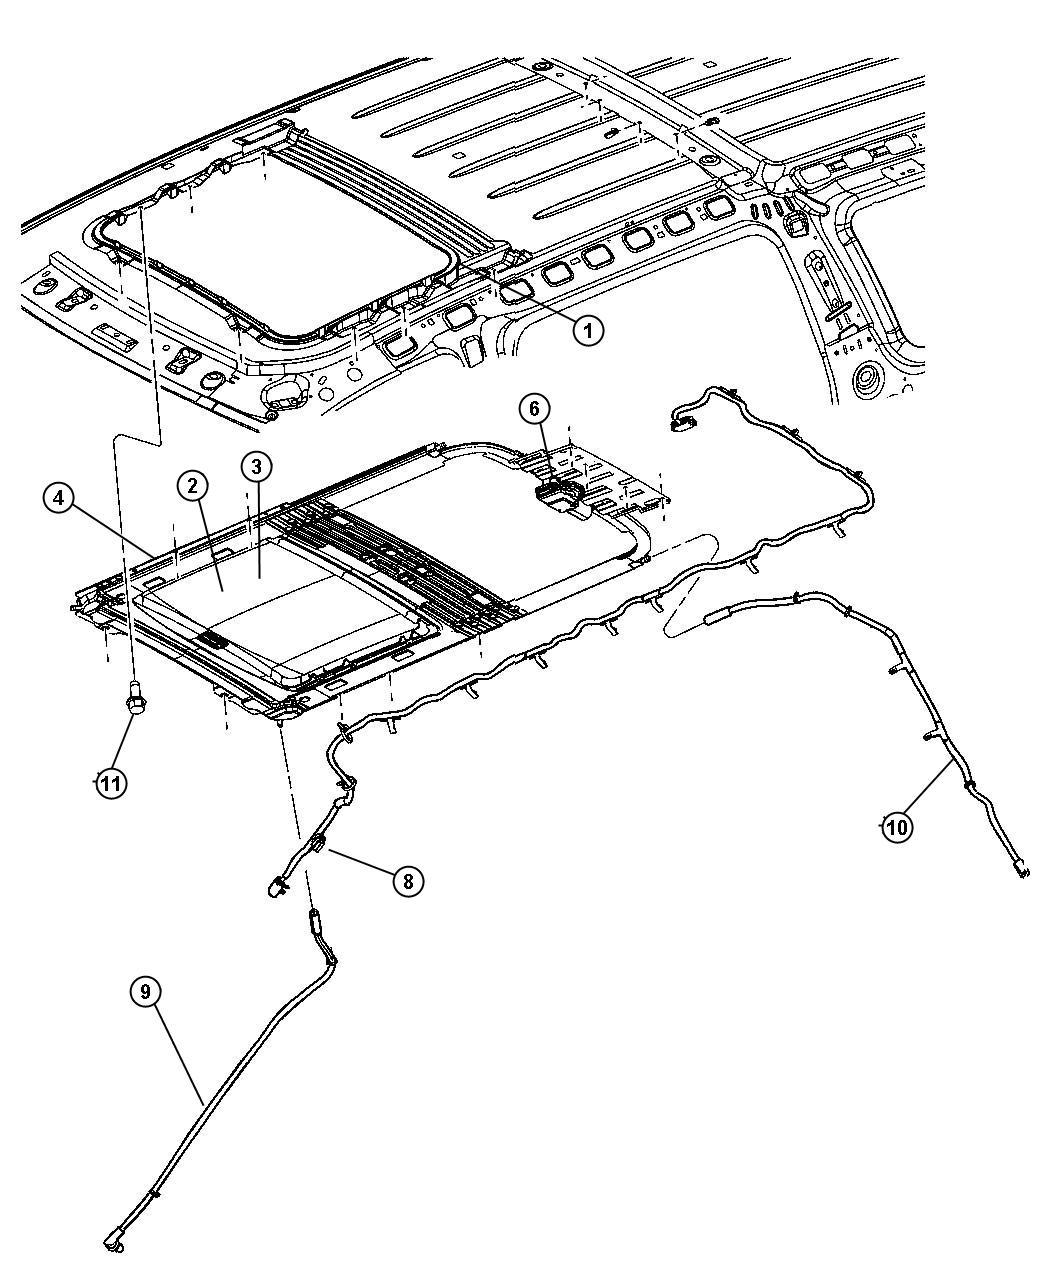 2004 Dodge Durango Roof Parts Diagram. Dodge. Auto Wiring